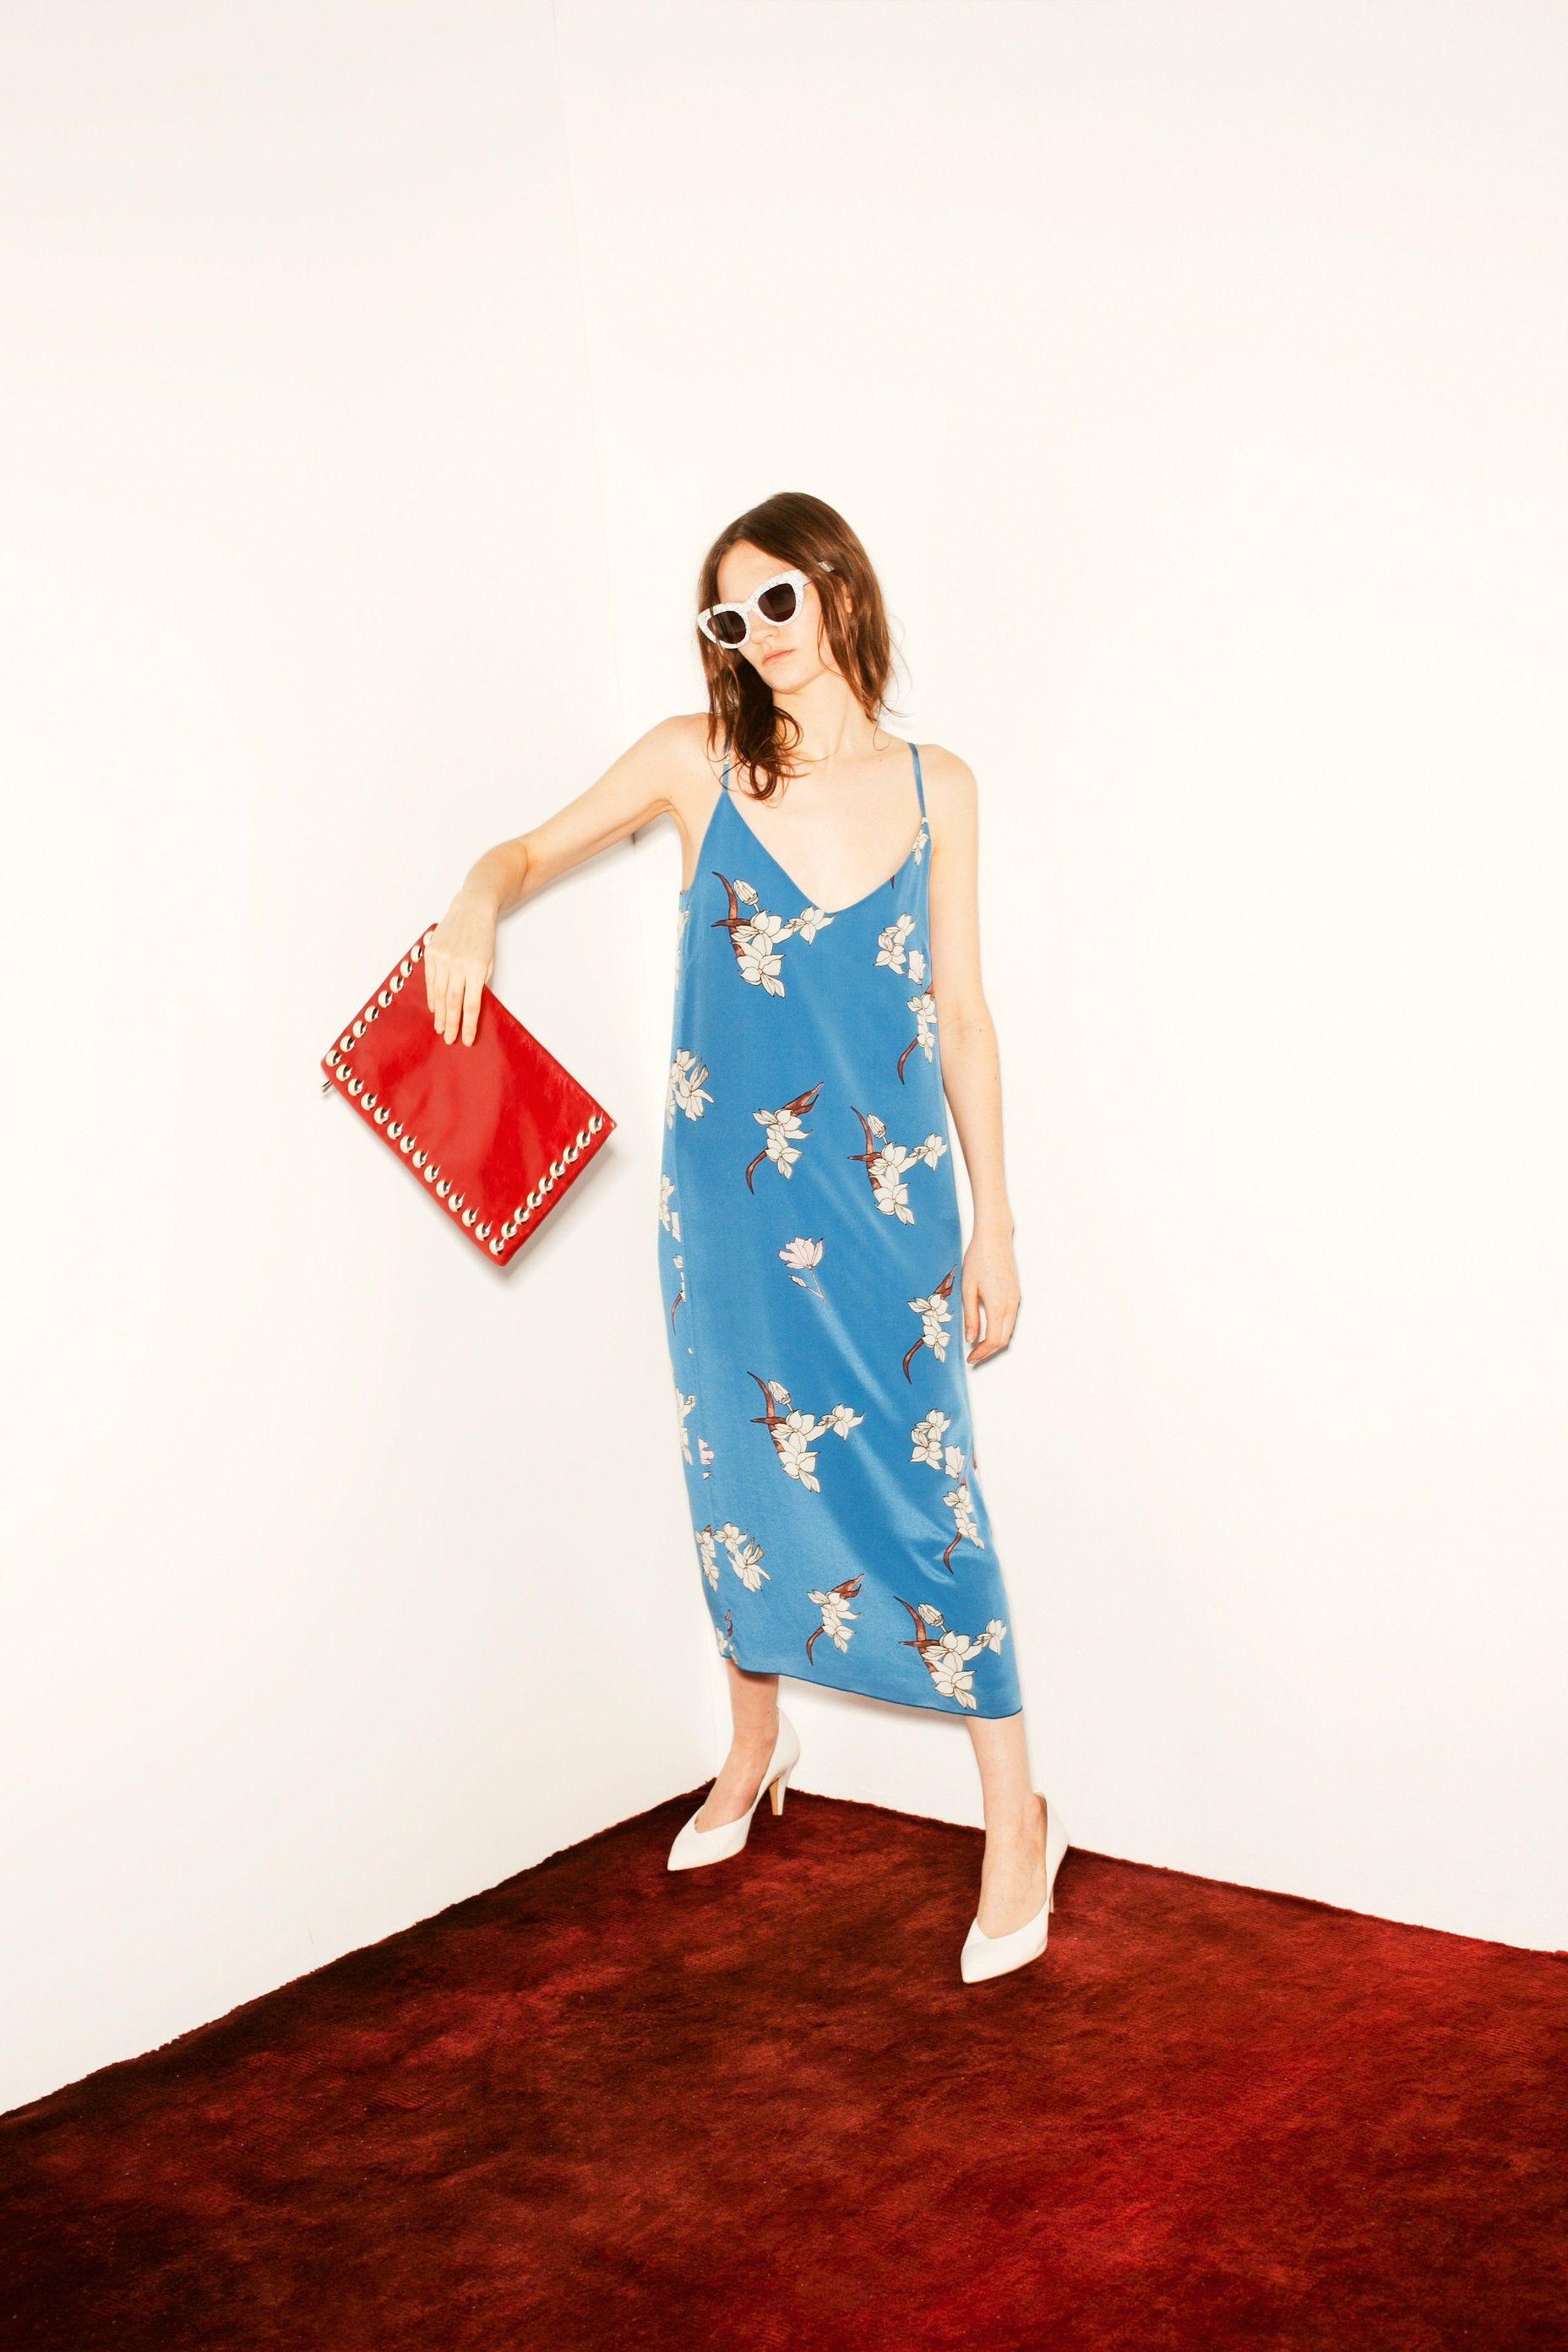 magnolia print dress bimba y lola ss